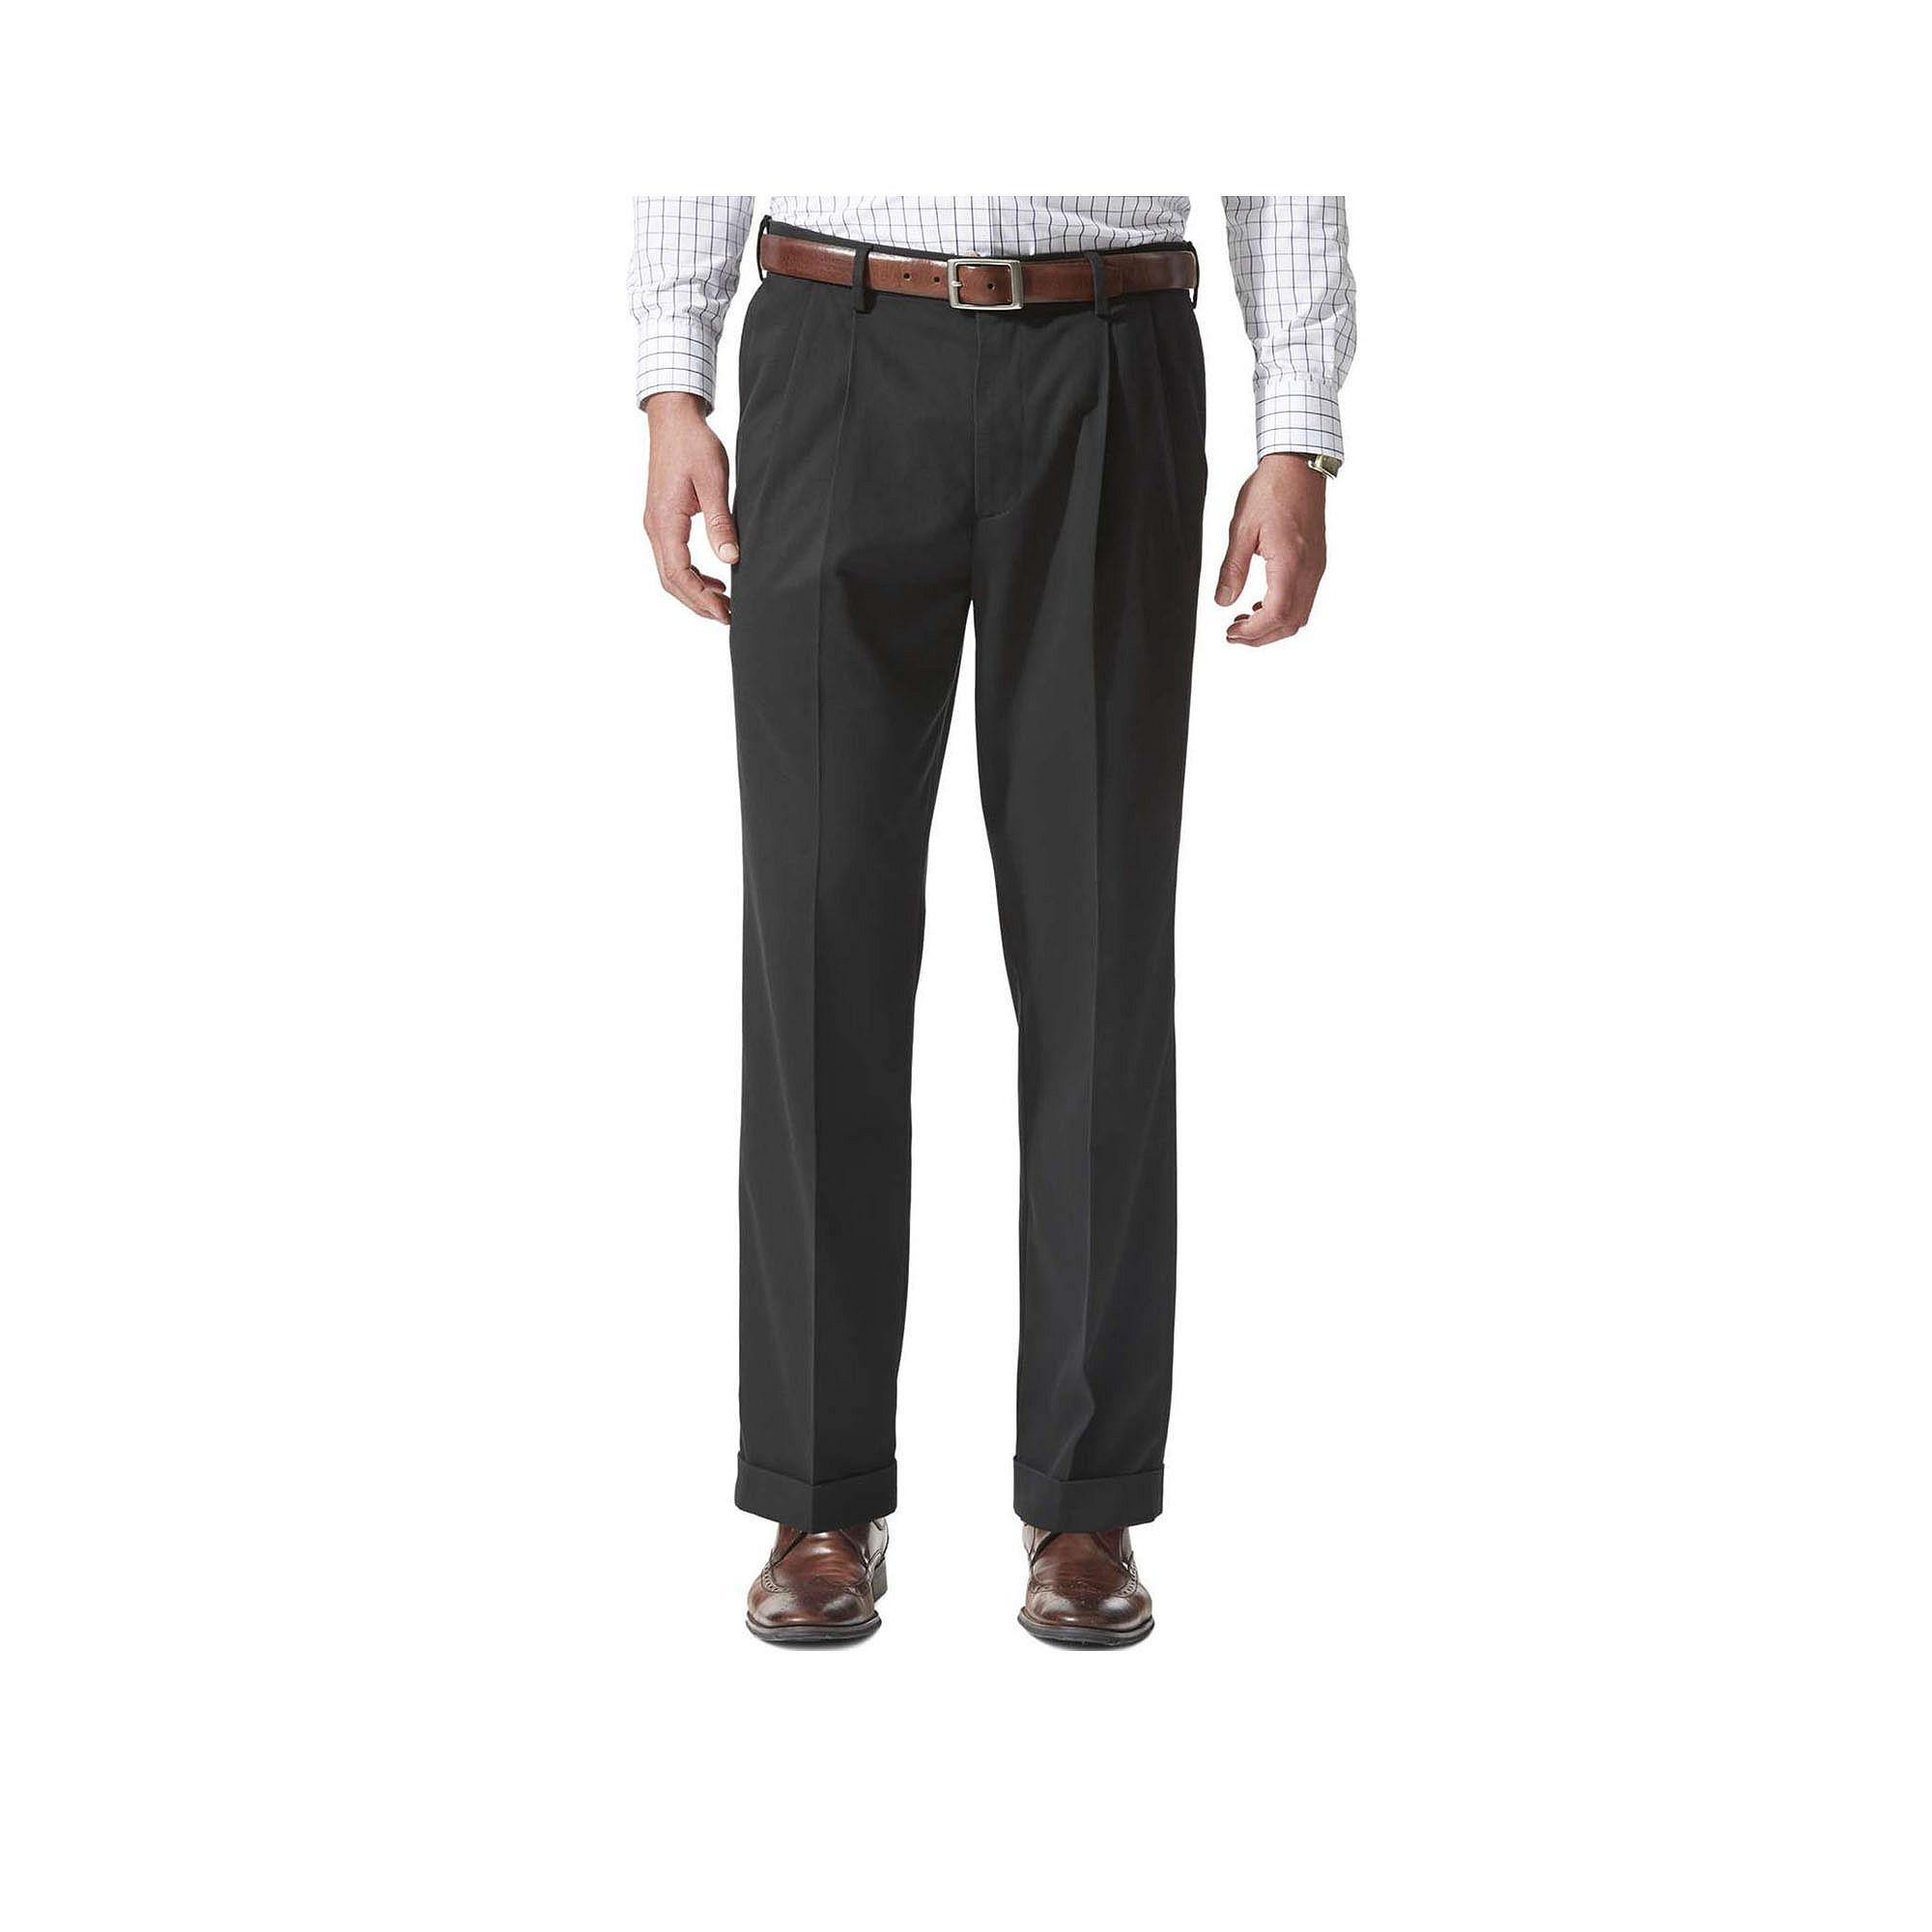 Dockers Comfort Khaki Relaxed Pleated Pants